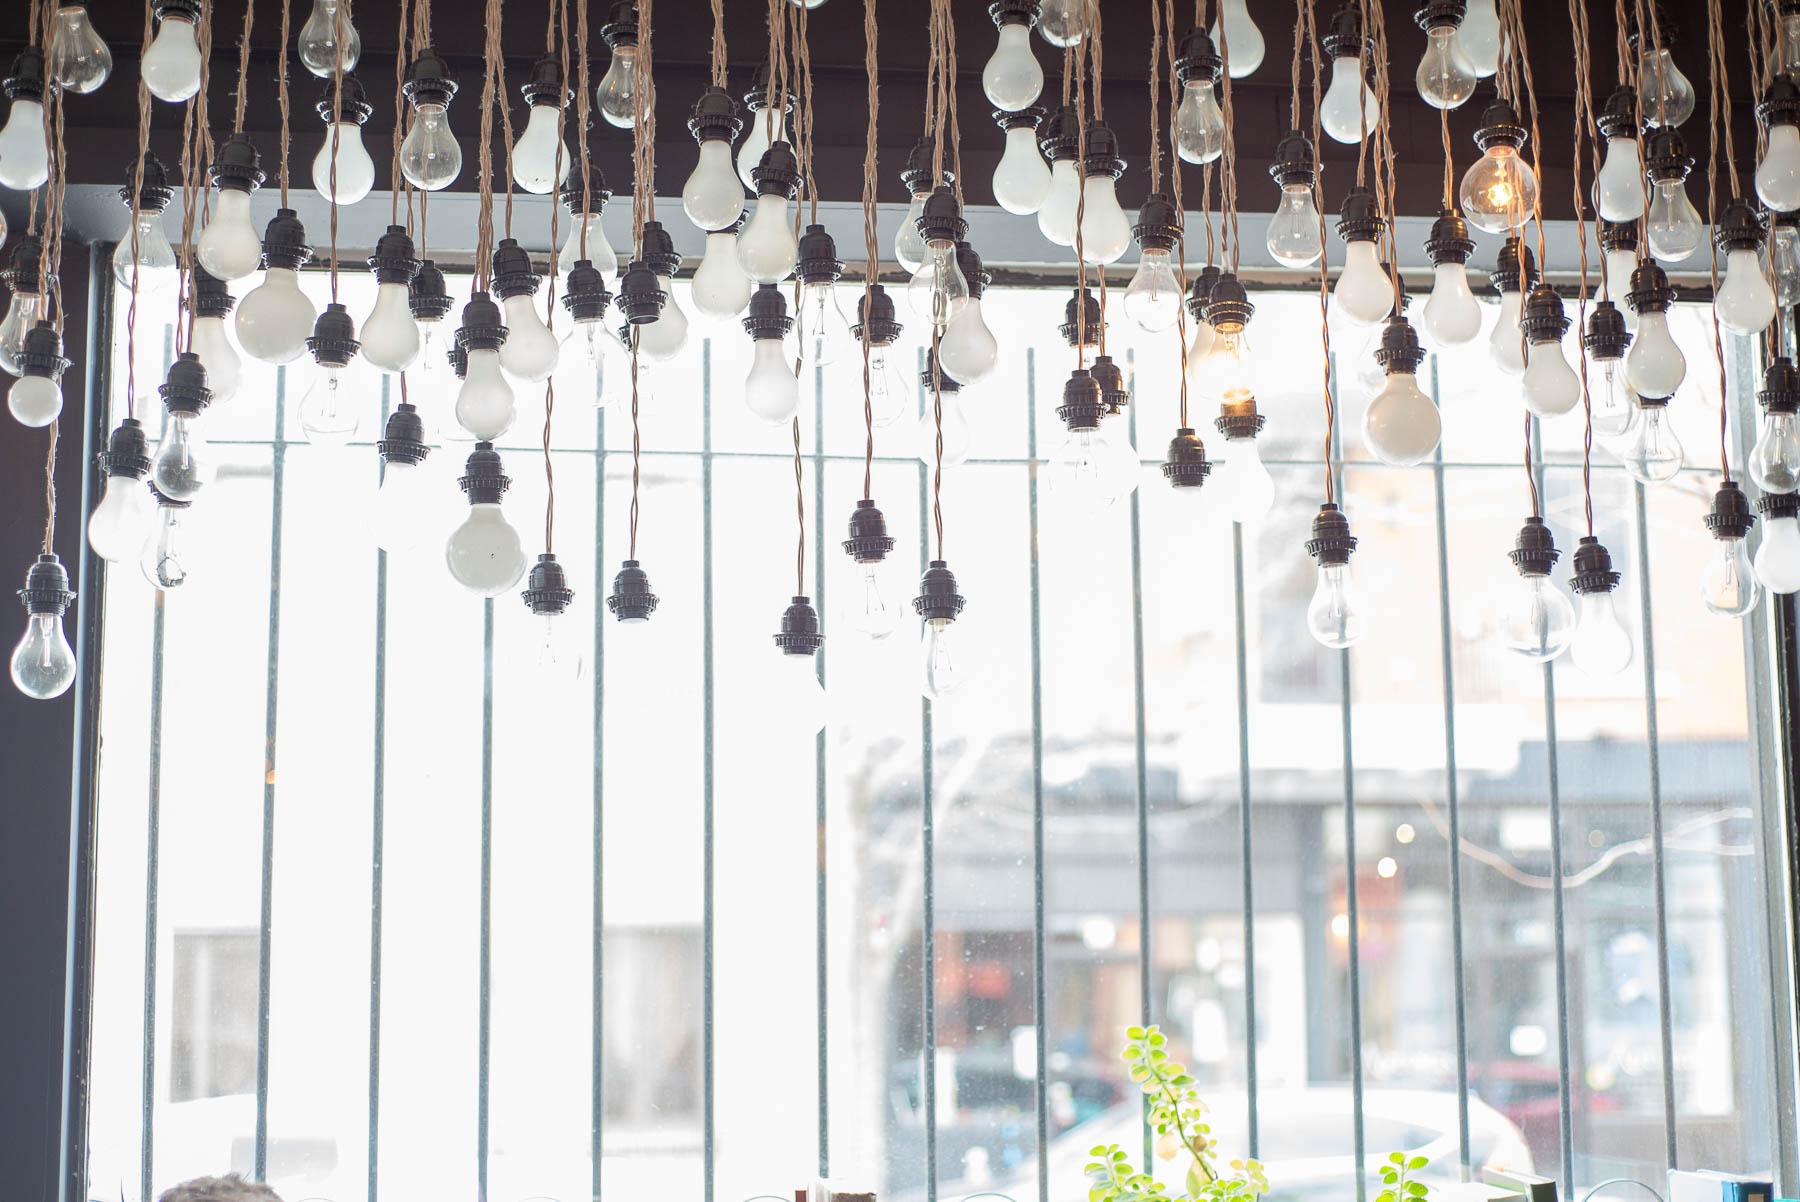 arts cafe deco ampoules foodologie